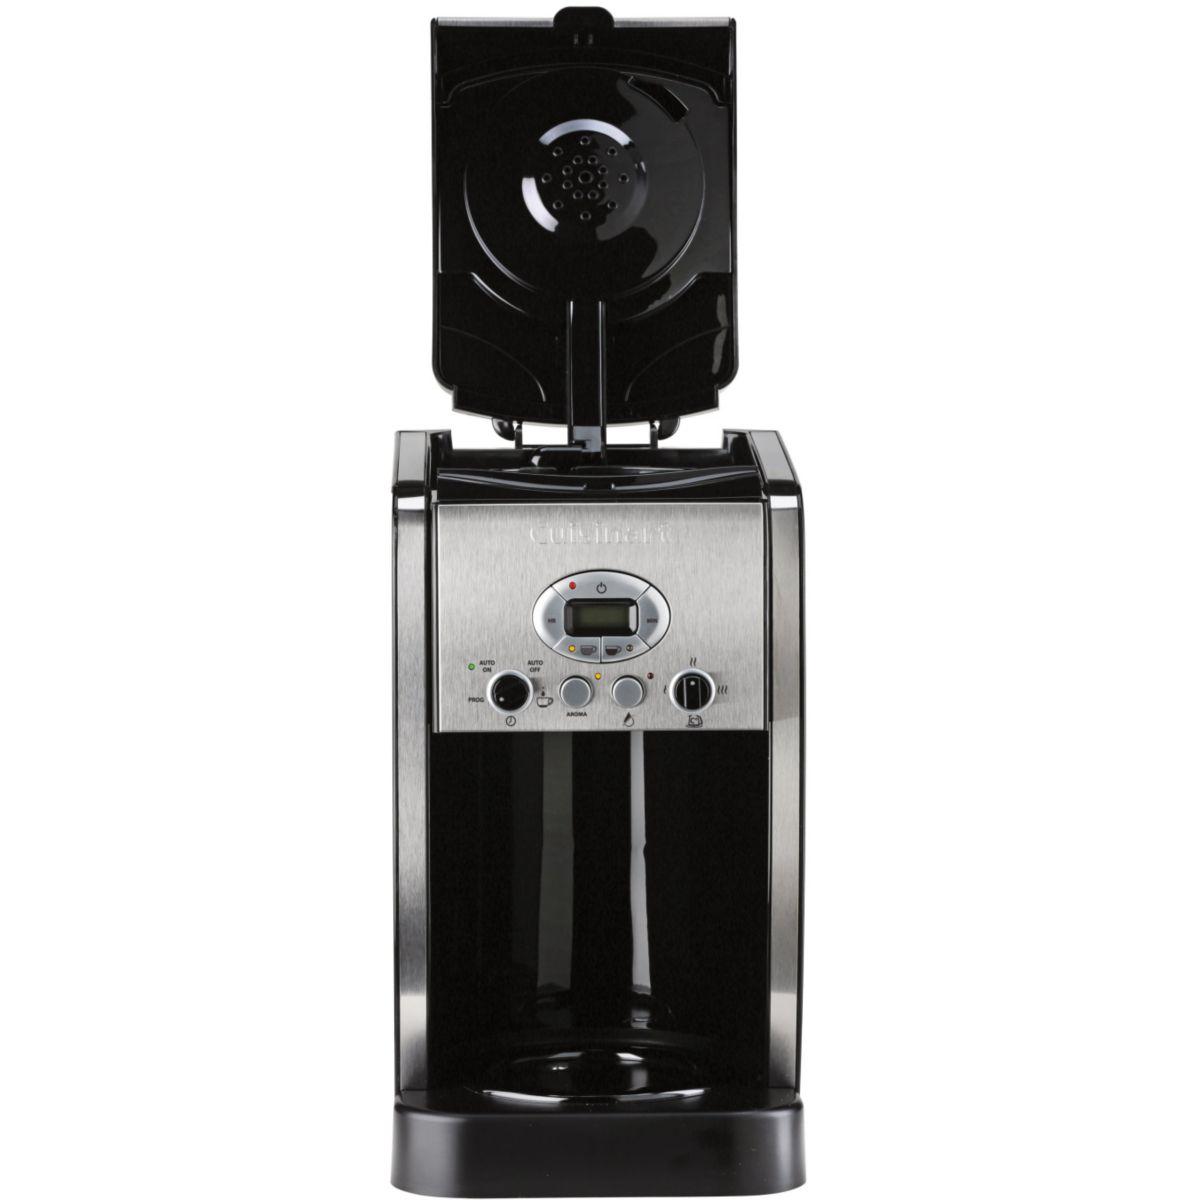 cuisinart dcc2650e cafeti re filtre programmable comparer avec. Black Bedroom Furniture Sets. Home Design Ideas